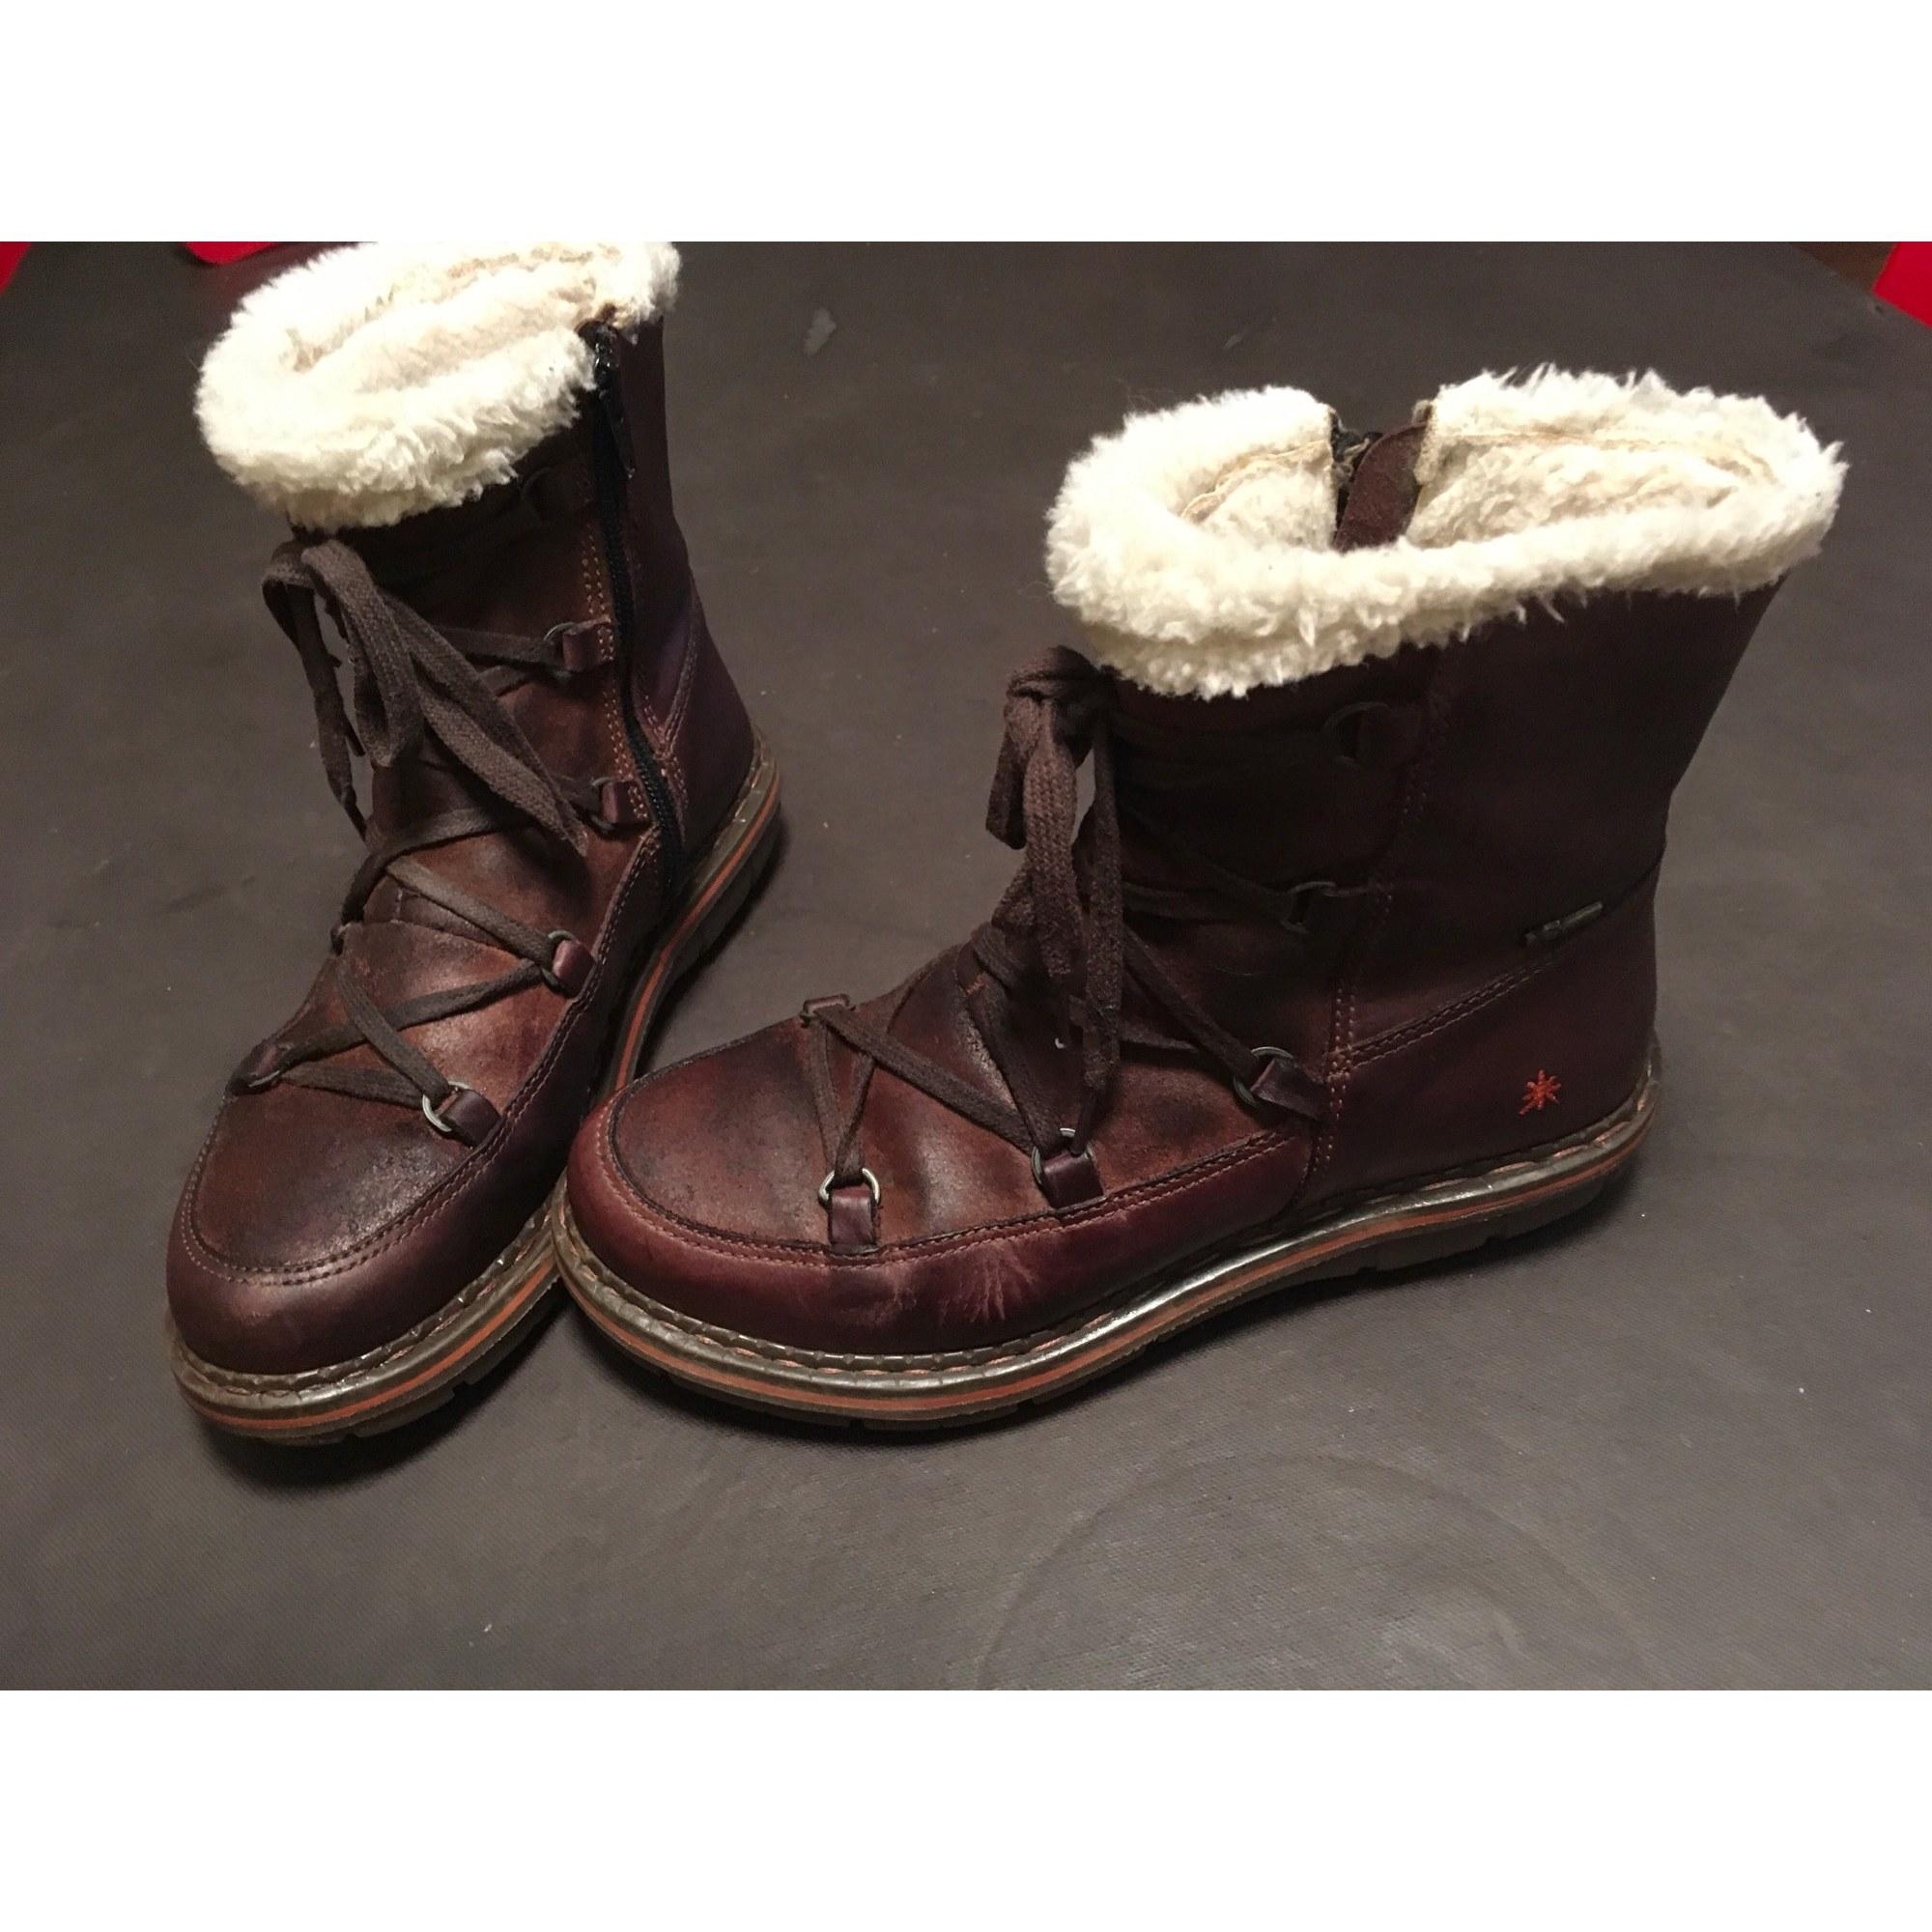 Bottines & low boots plates ART Marron